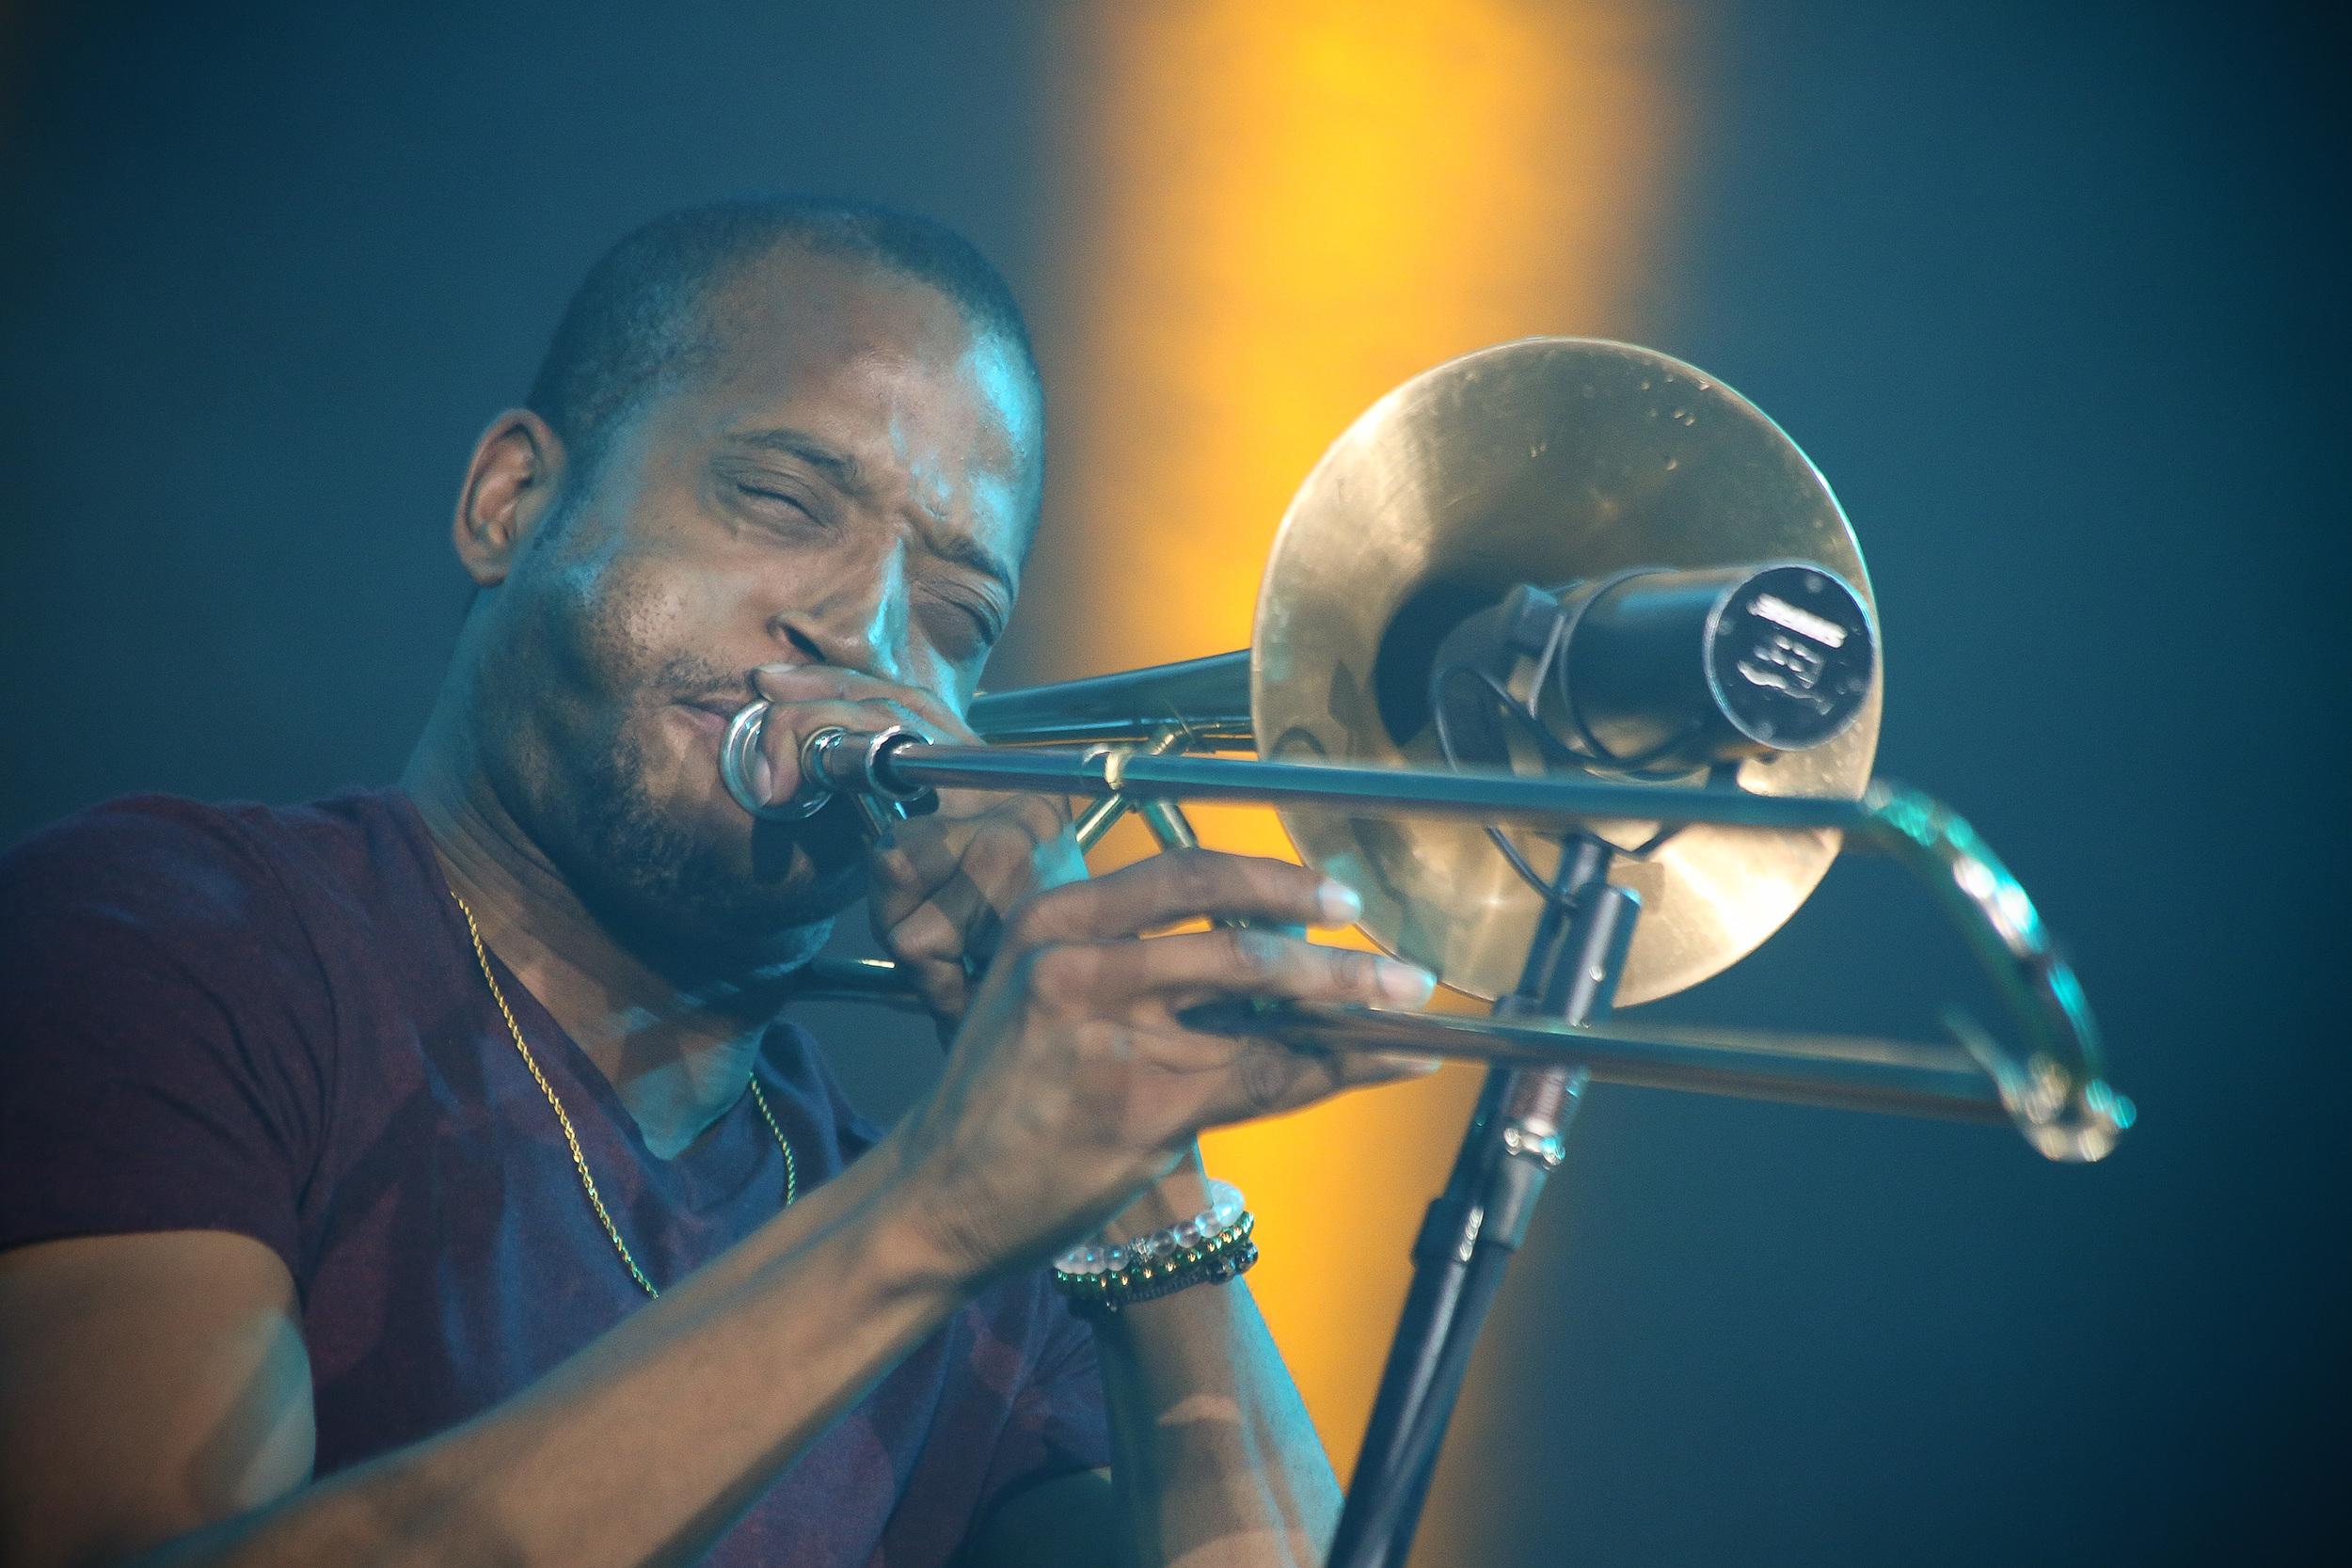 trombone shorty with zac brown band_bluesfest15_josh groom (2).jpg